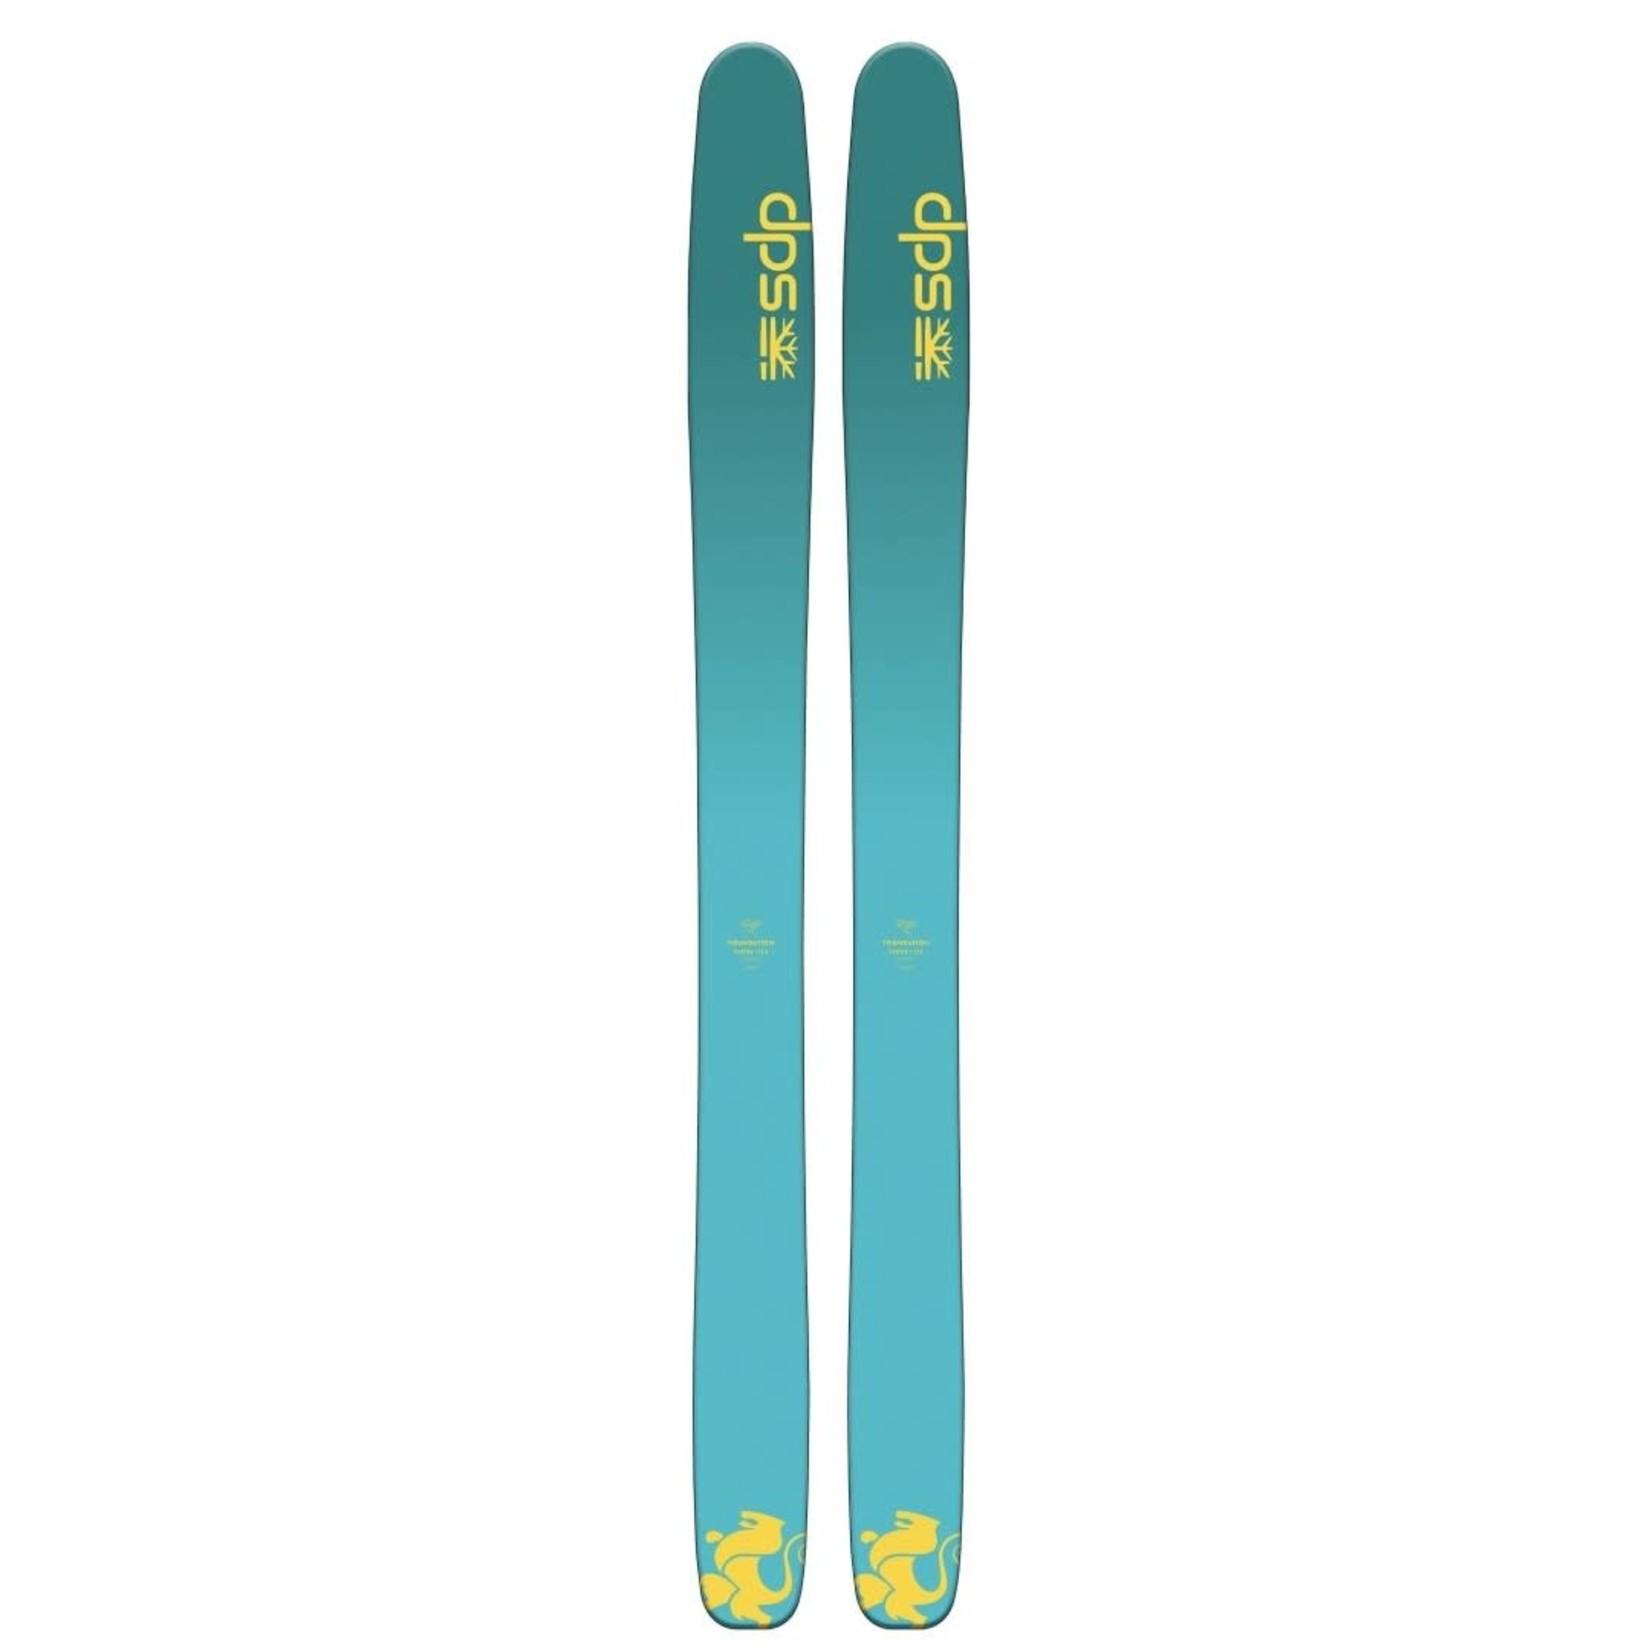 DPS DPS Yvette 112 Foundation Ski - Women